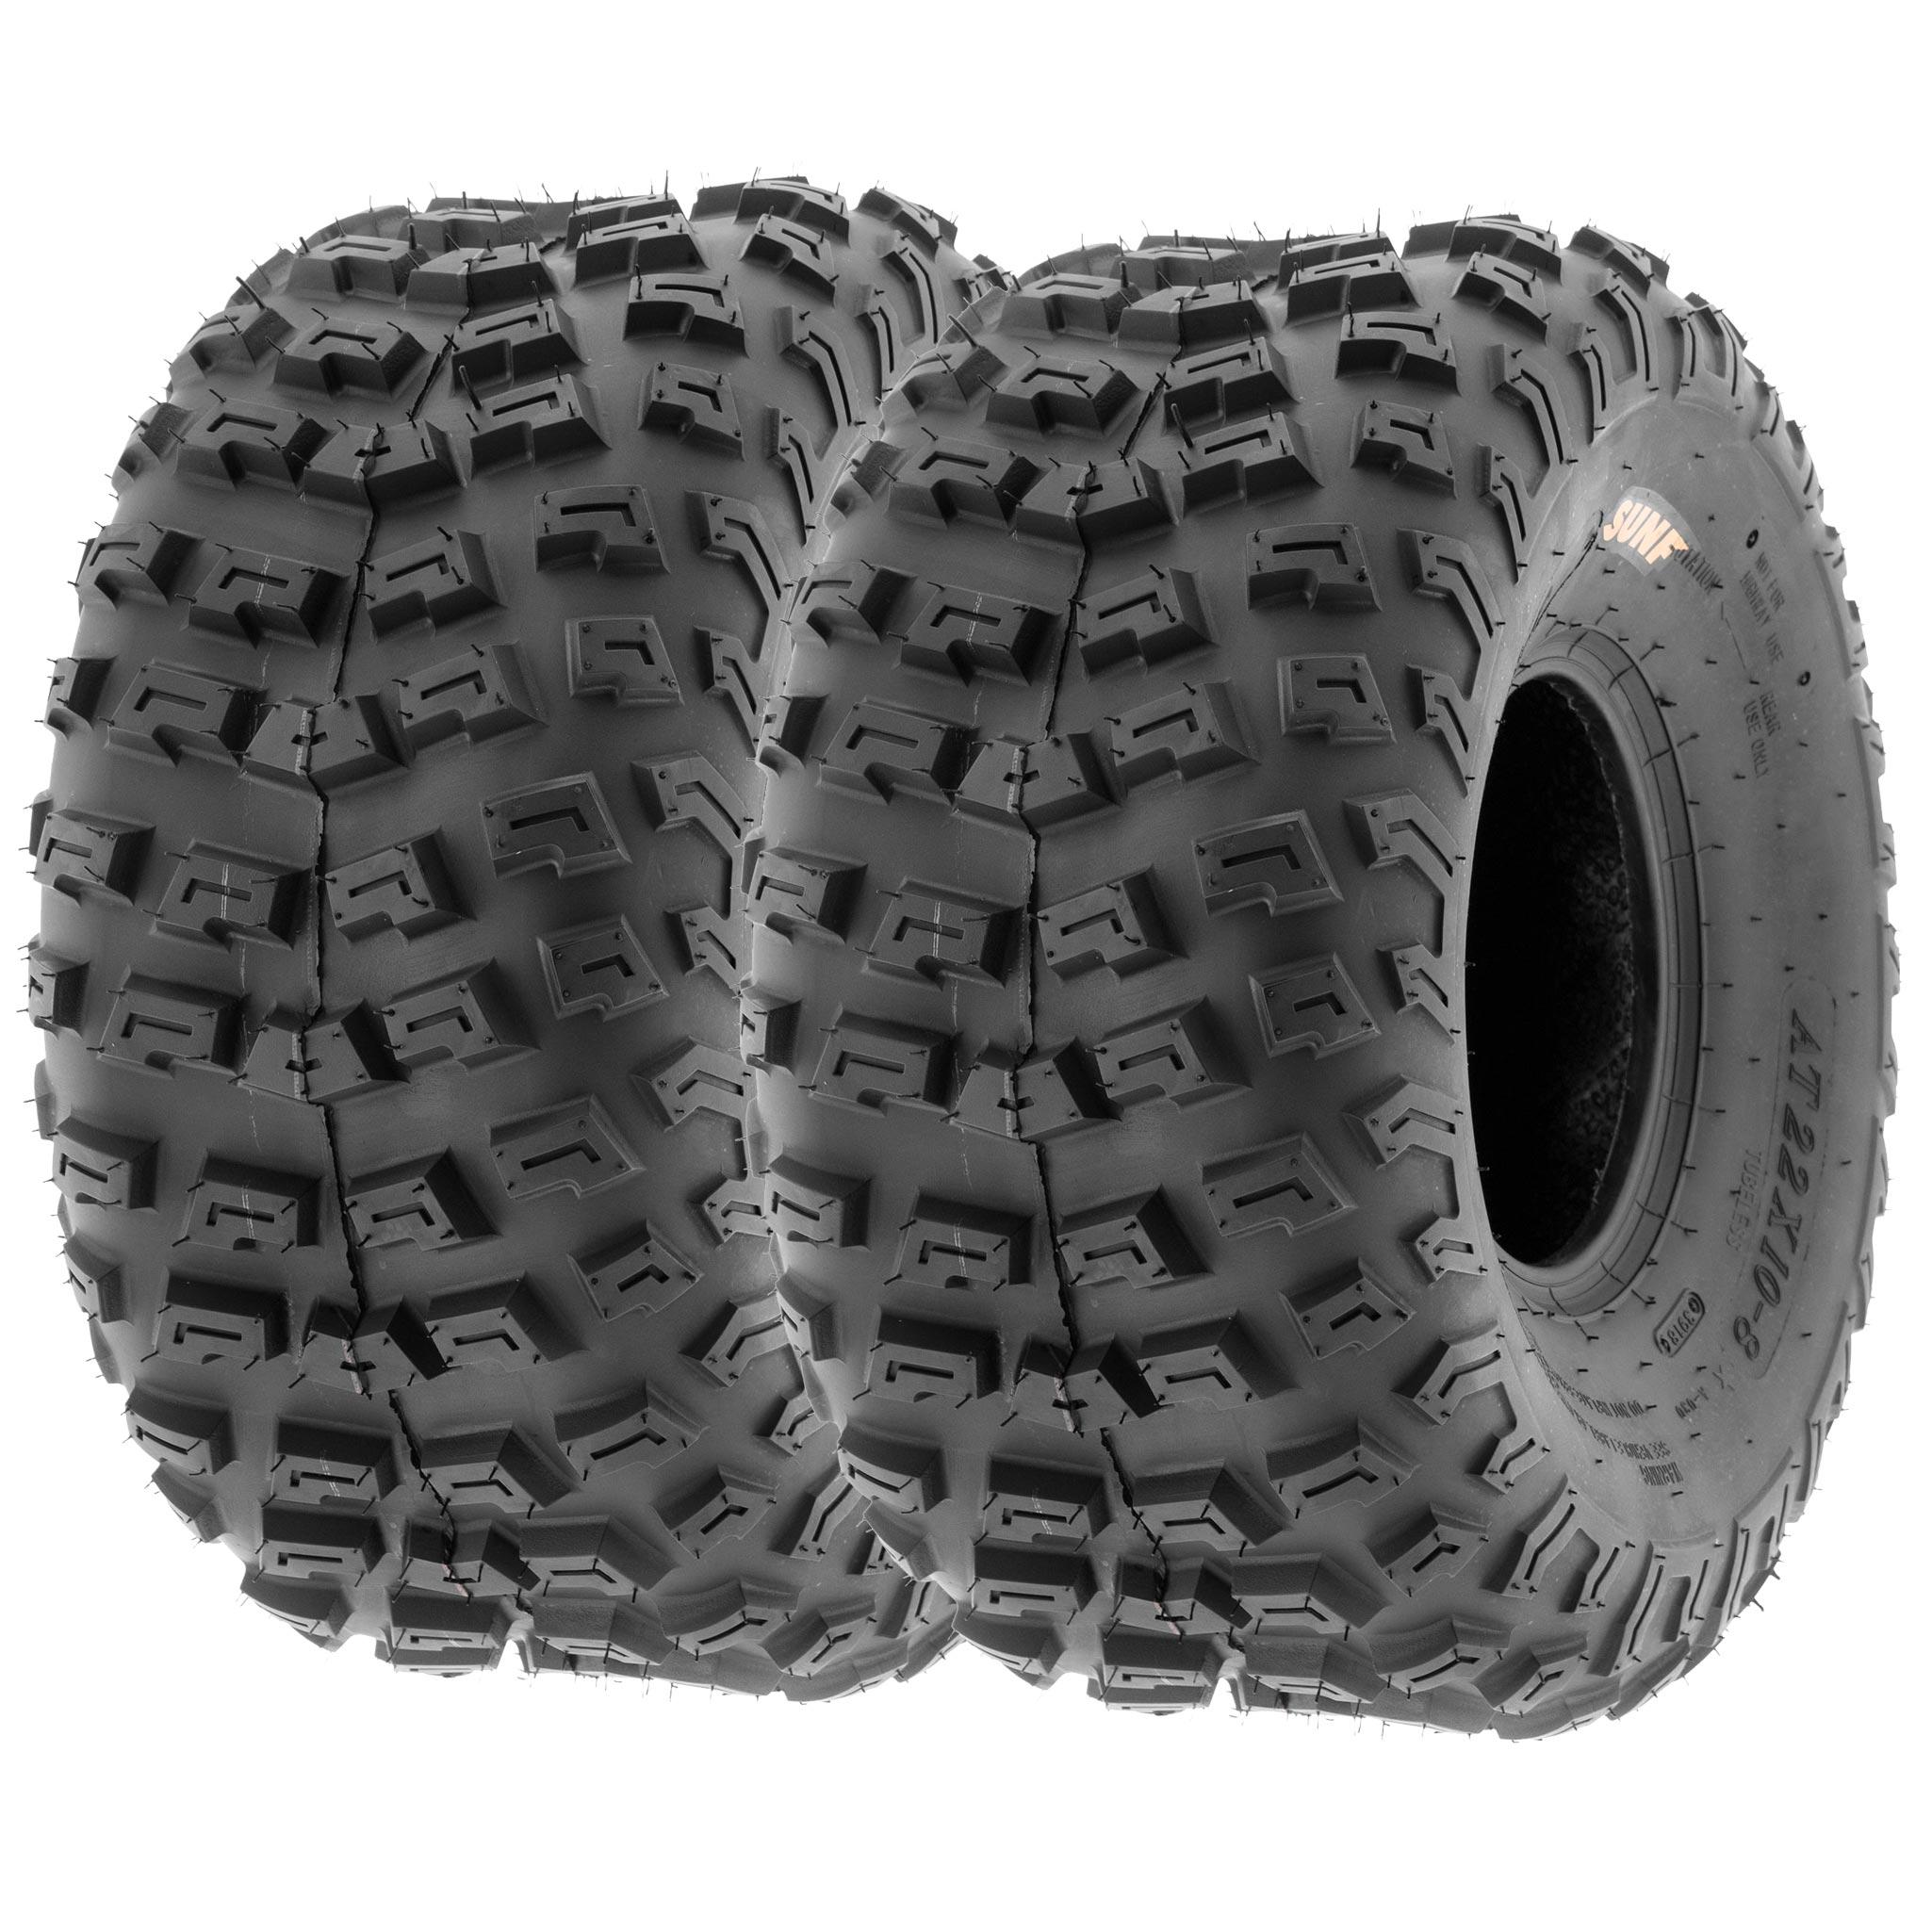 2 21x7-10 21x7x10 ATV UTV All Terrain AT 6 Ply Tires A001 by SunF Pair of